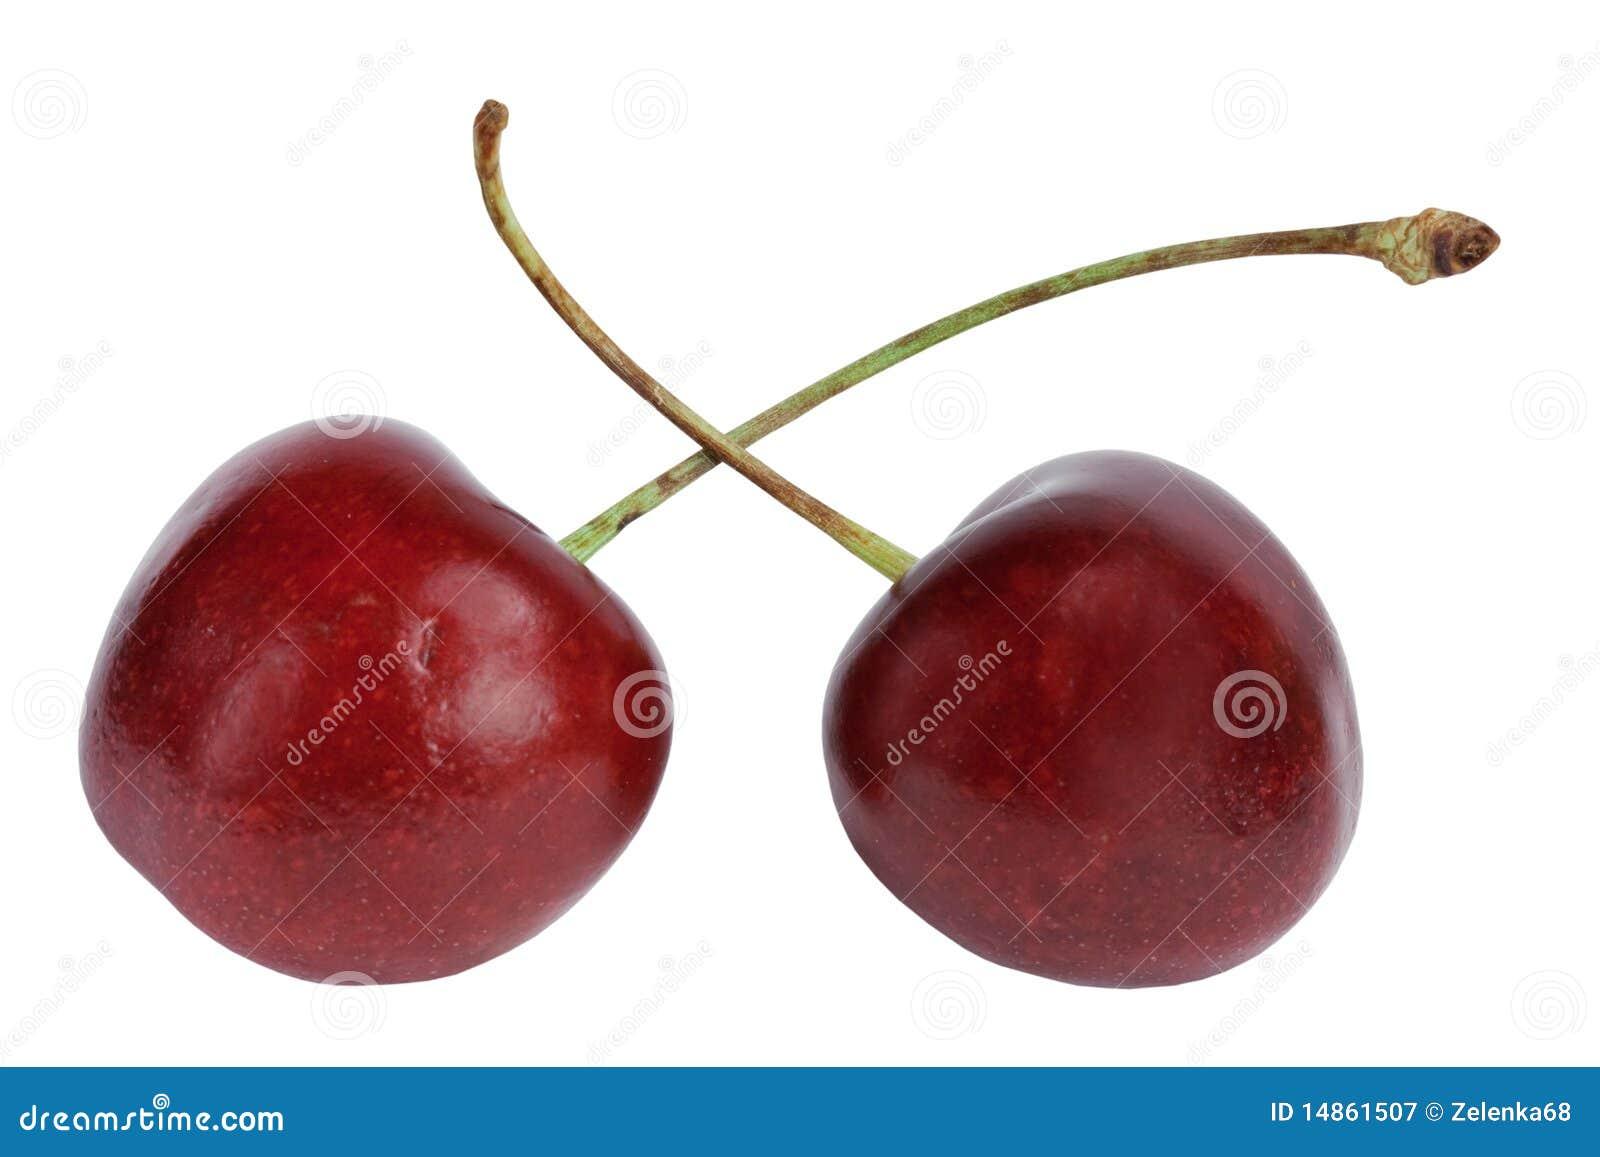 Fruit a sweet cherry